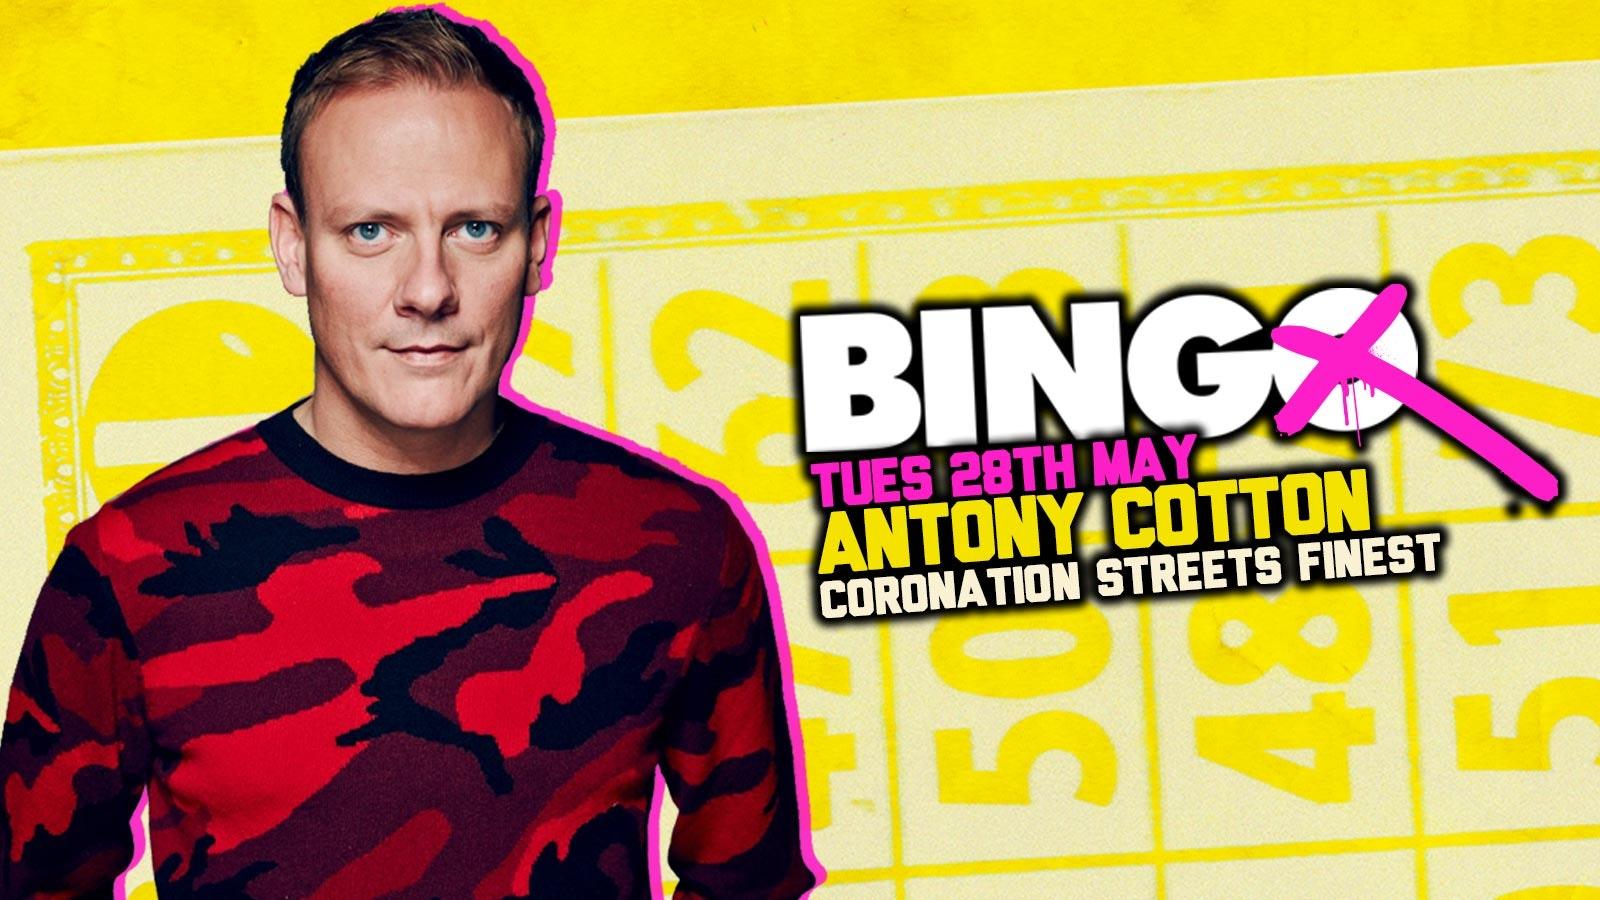 Bierkeller Bingo With Antony Cotton